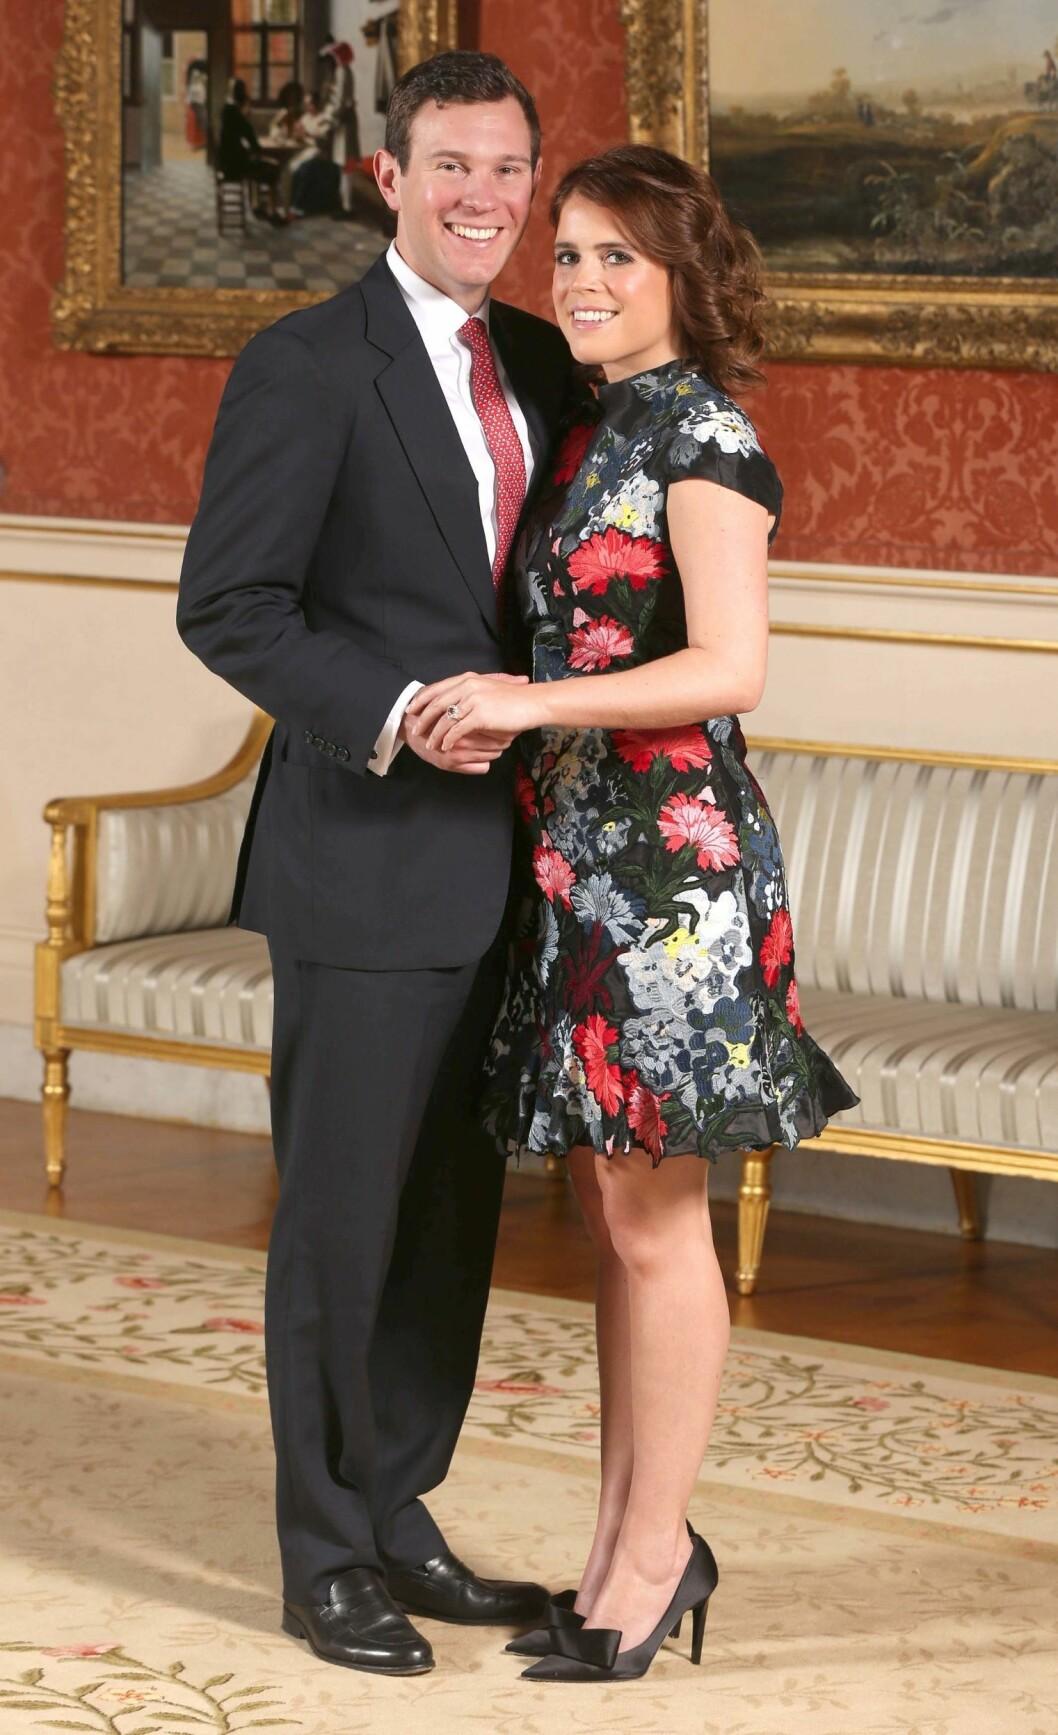 FORLOVELSE: Eugenie og Jack forlovet seg 22. januar 2018. FOTO: NTB Scanpix